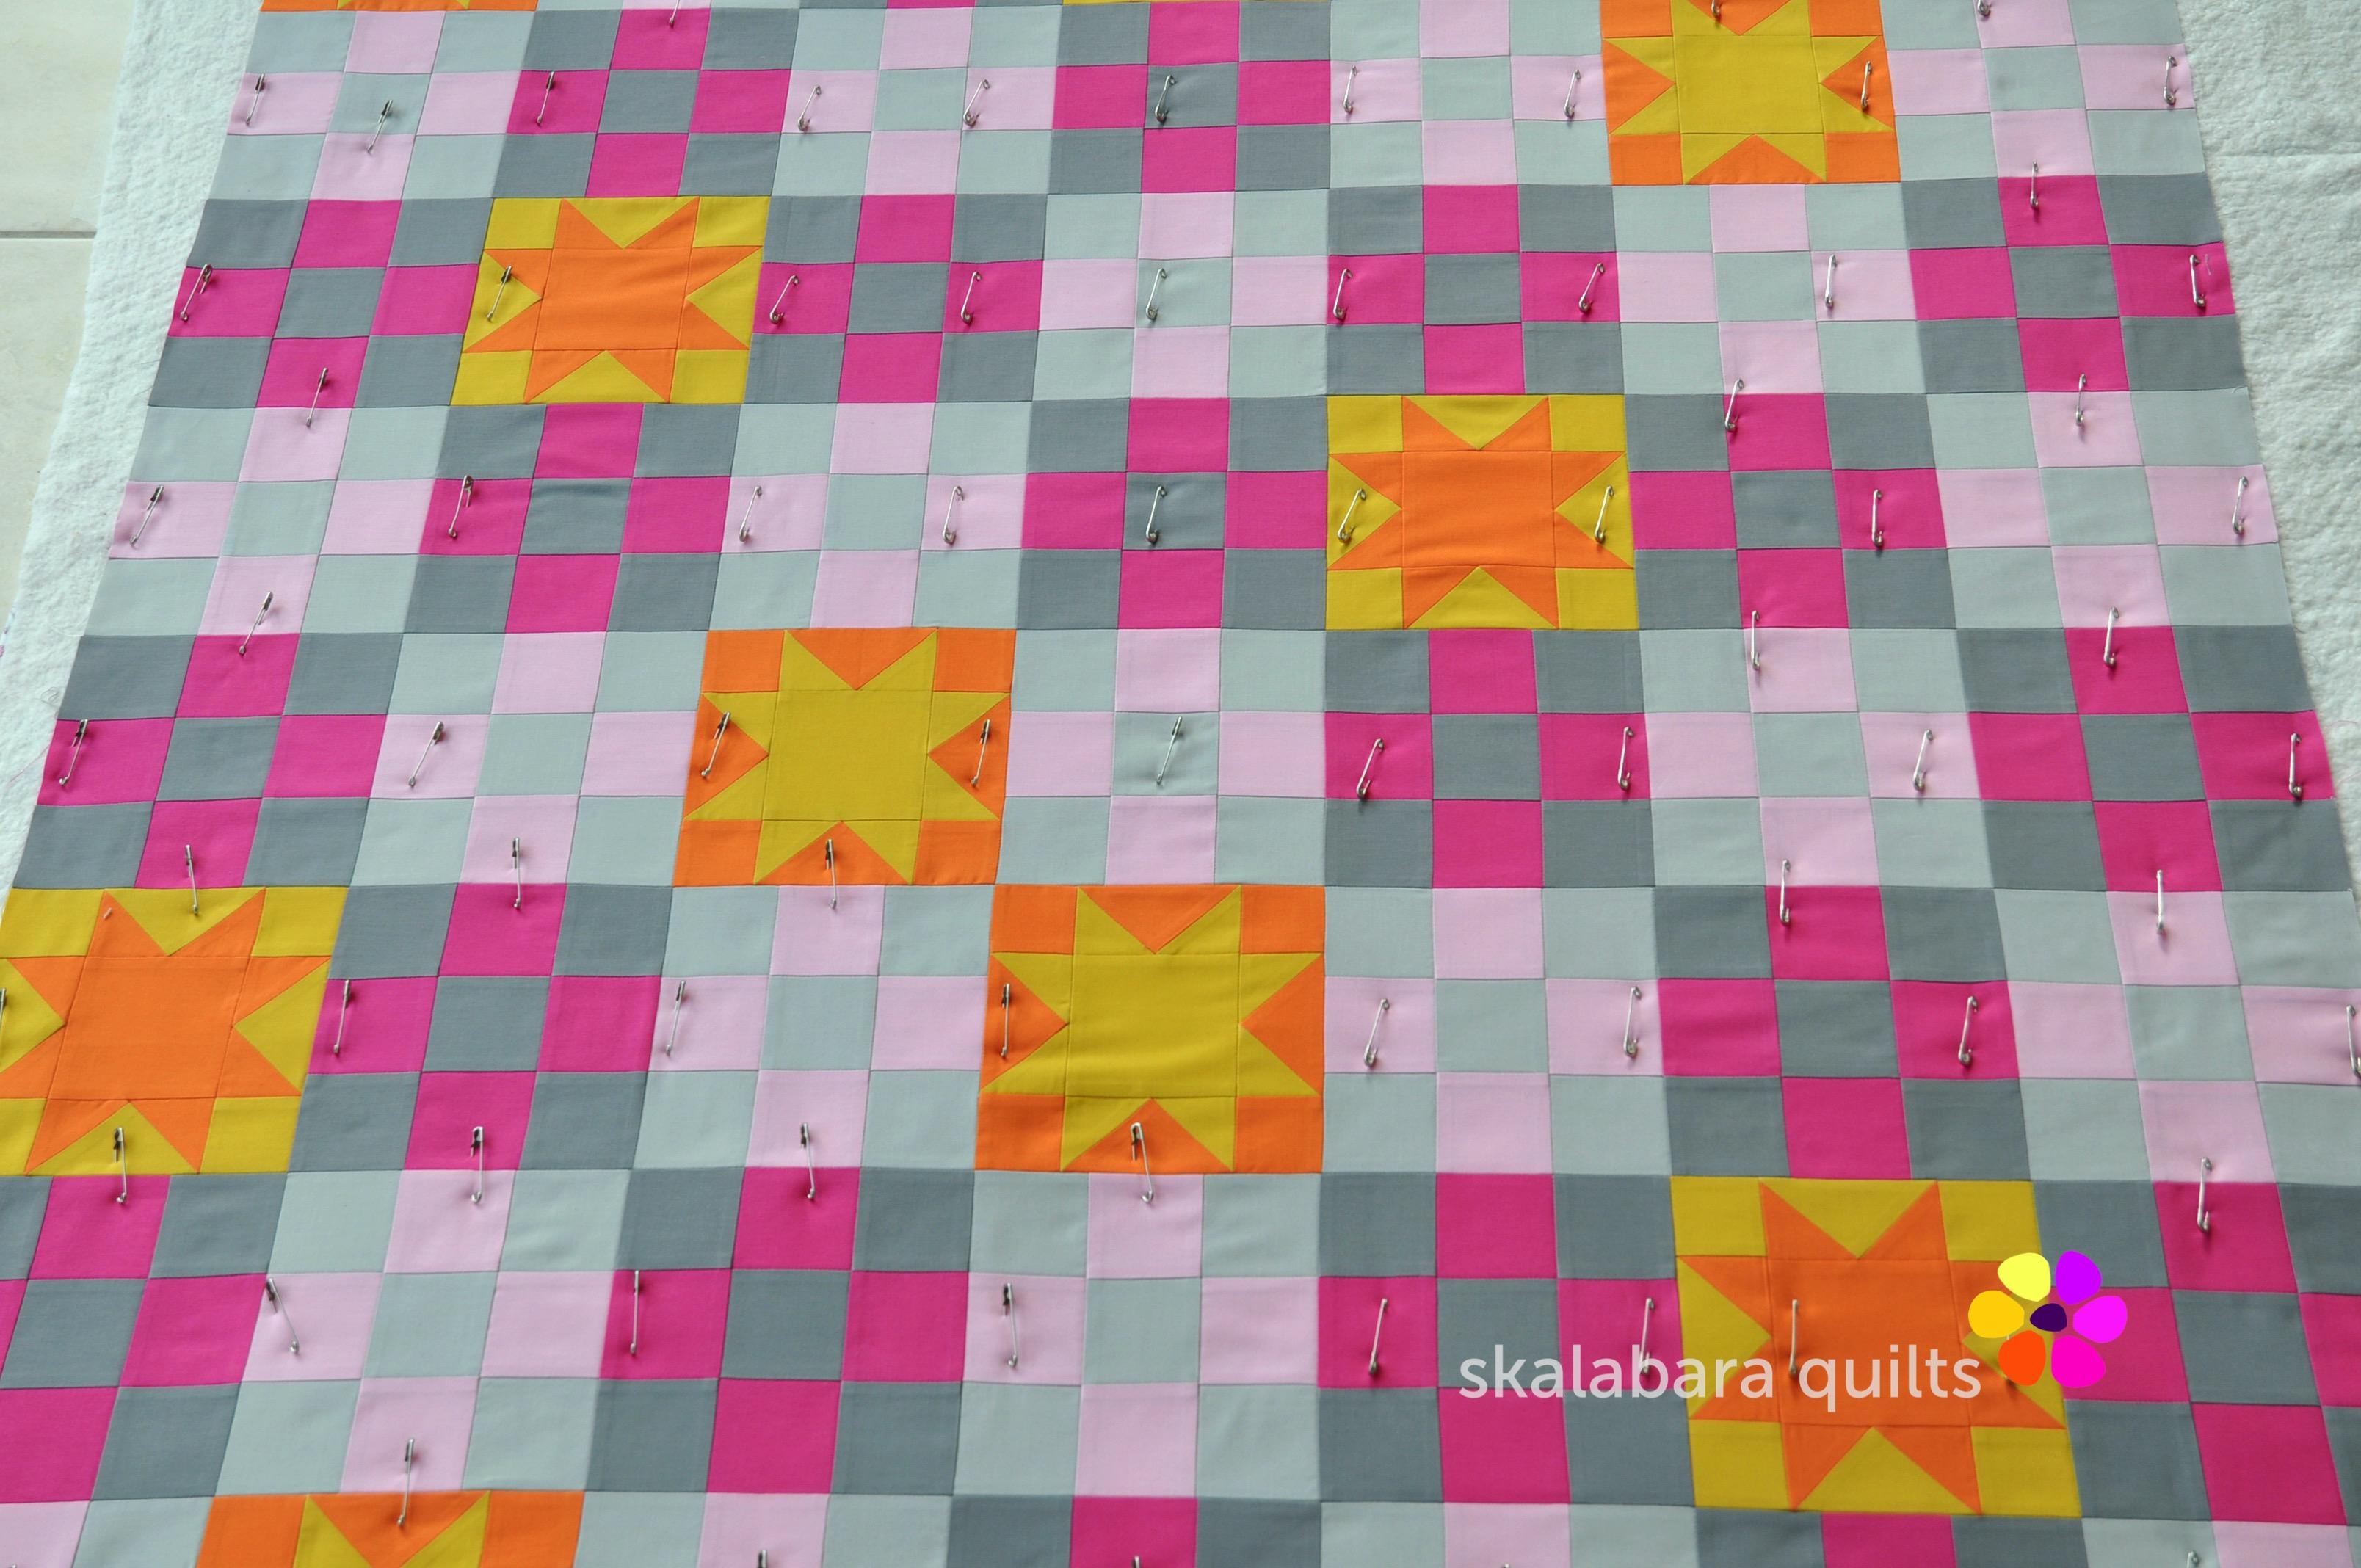 21 Q campfire glow pinning 1 - skalabara quilts